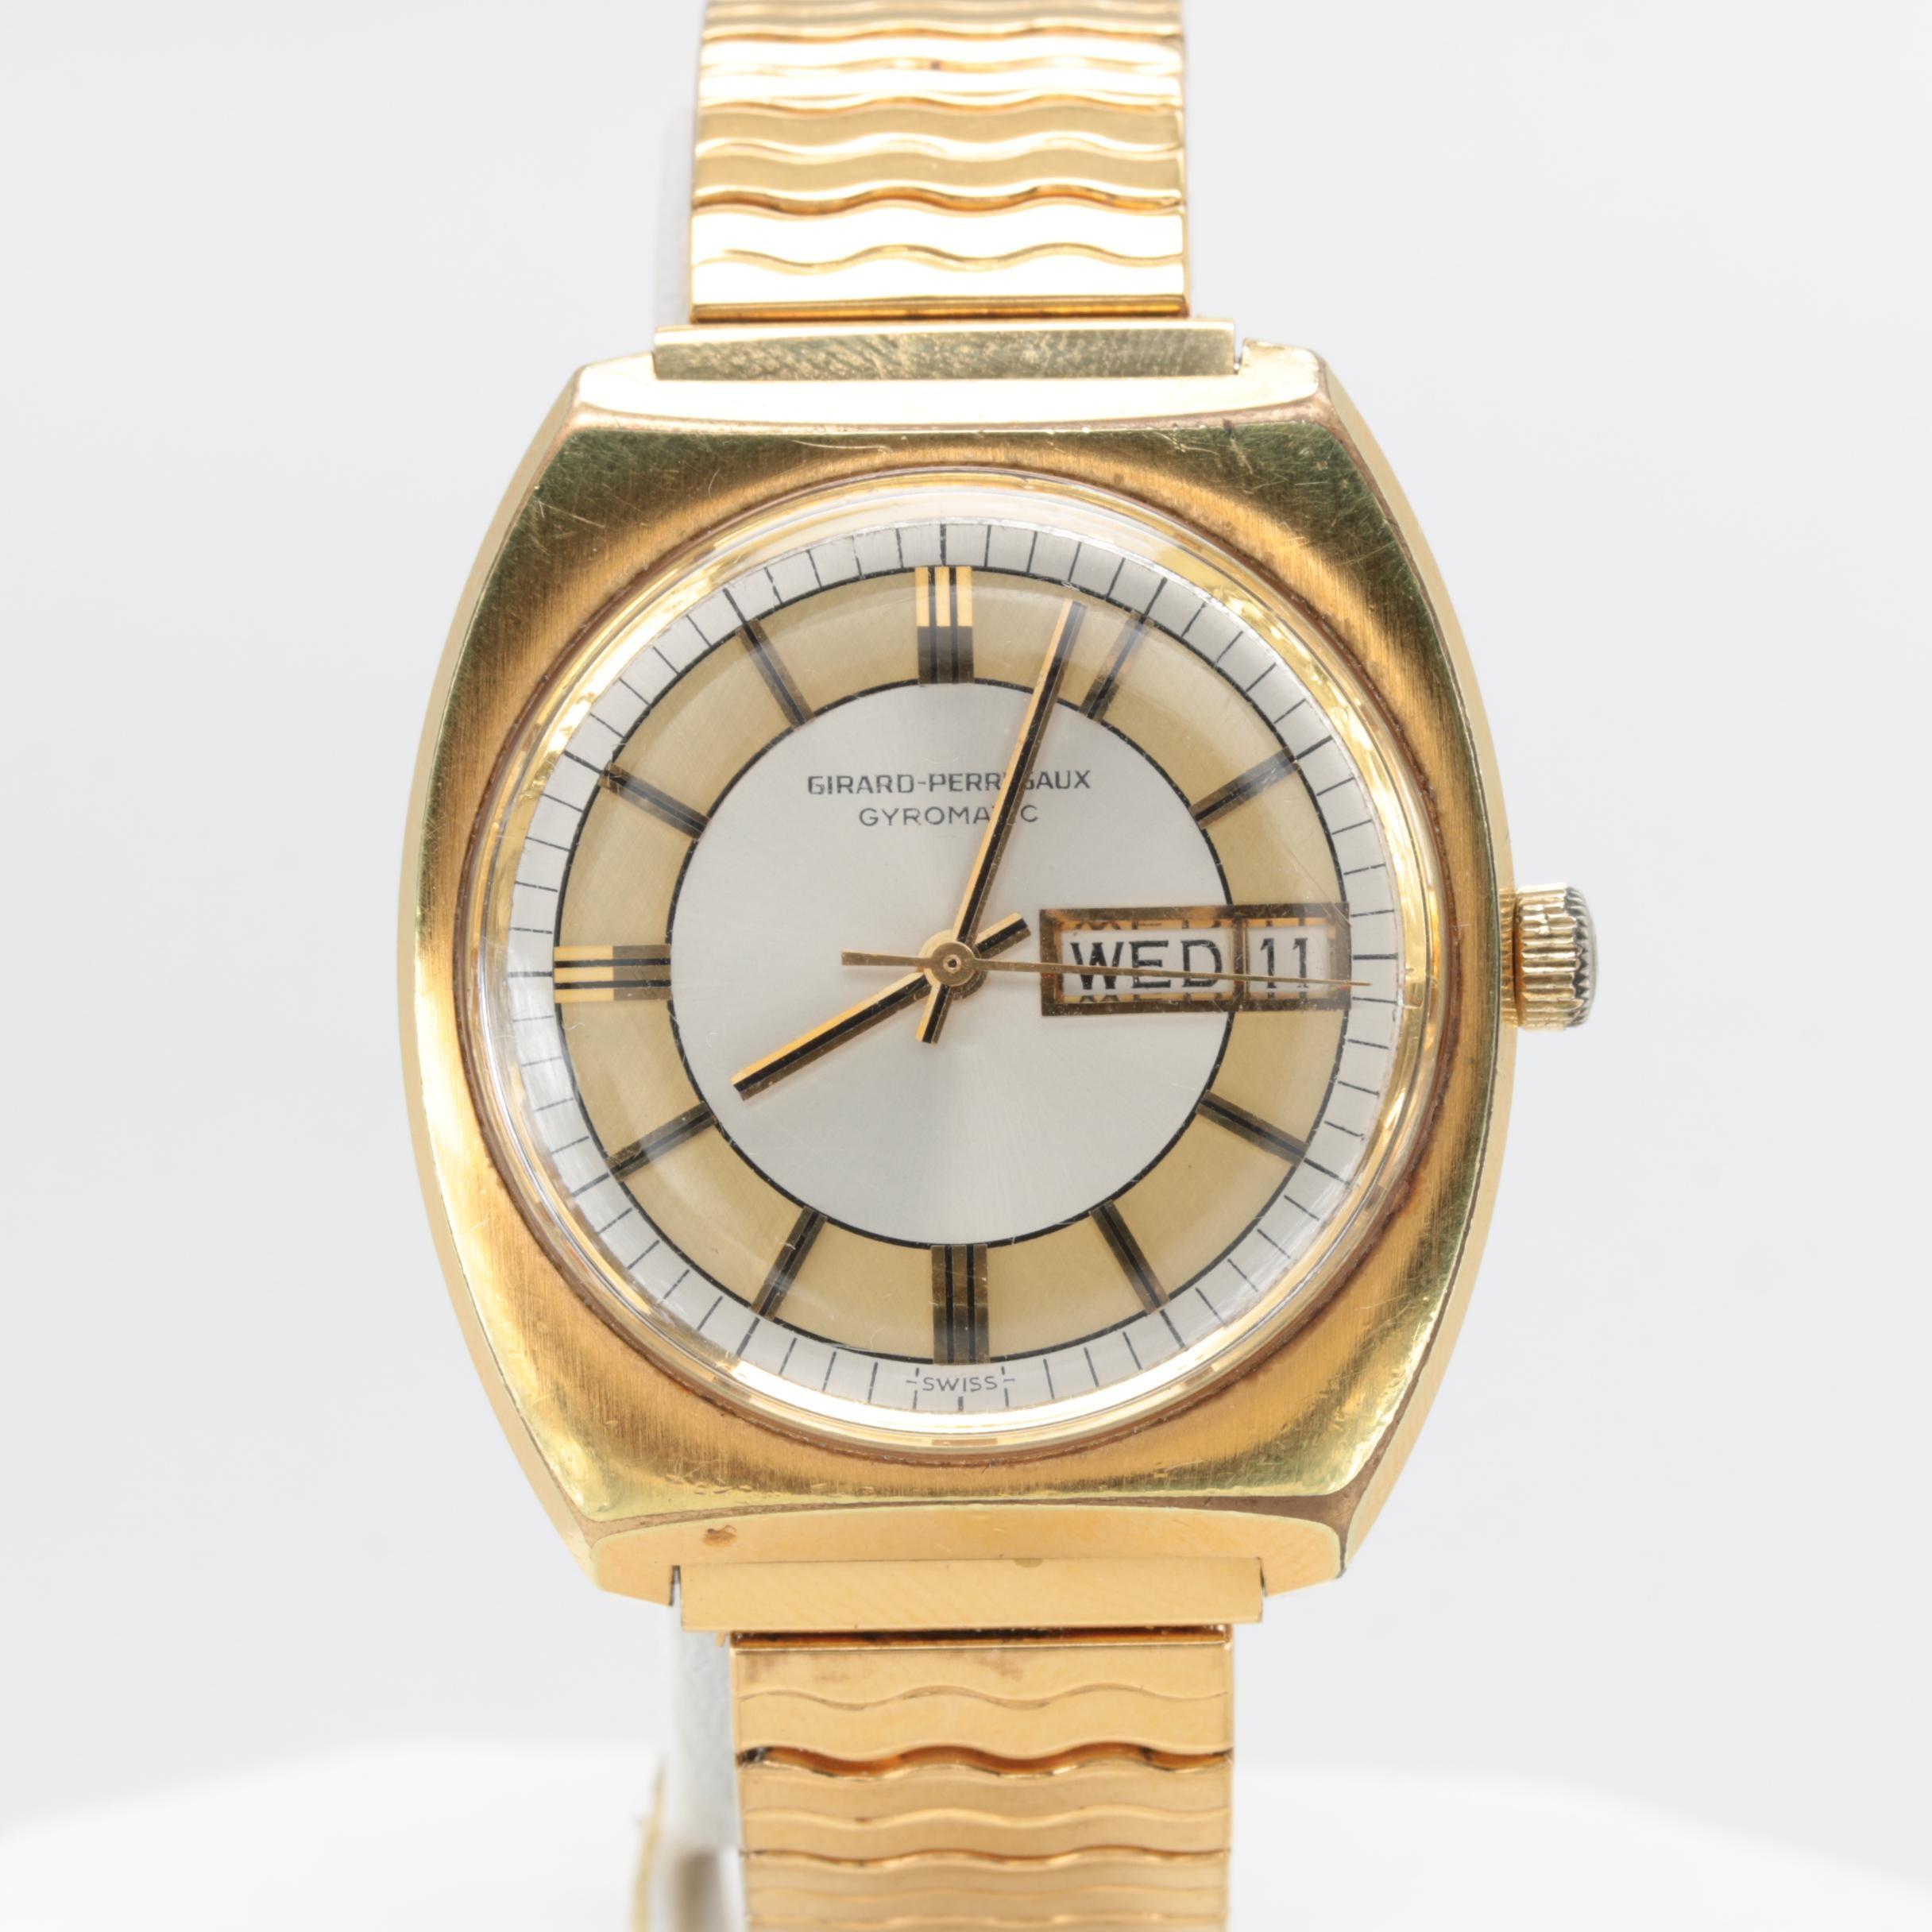 Girard-Perregaux Gyromatic Gold Tone Wristwatch